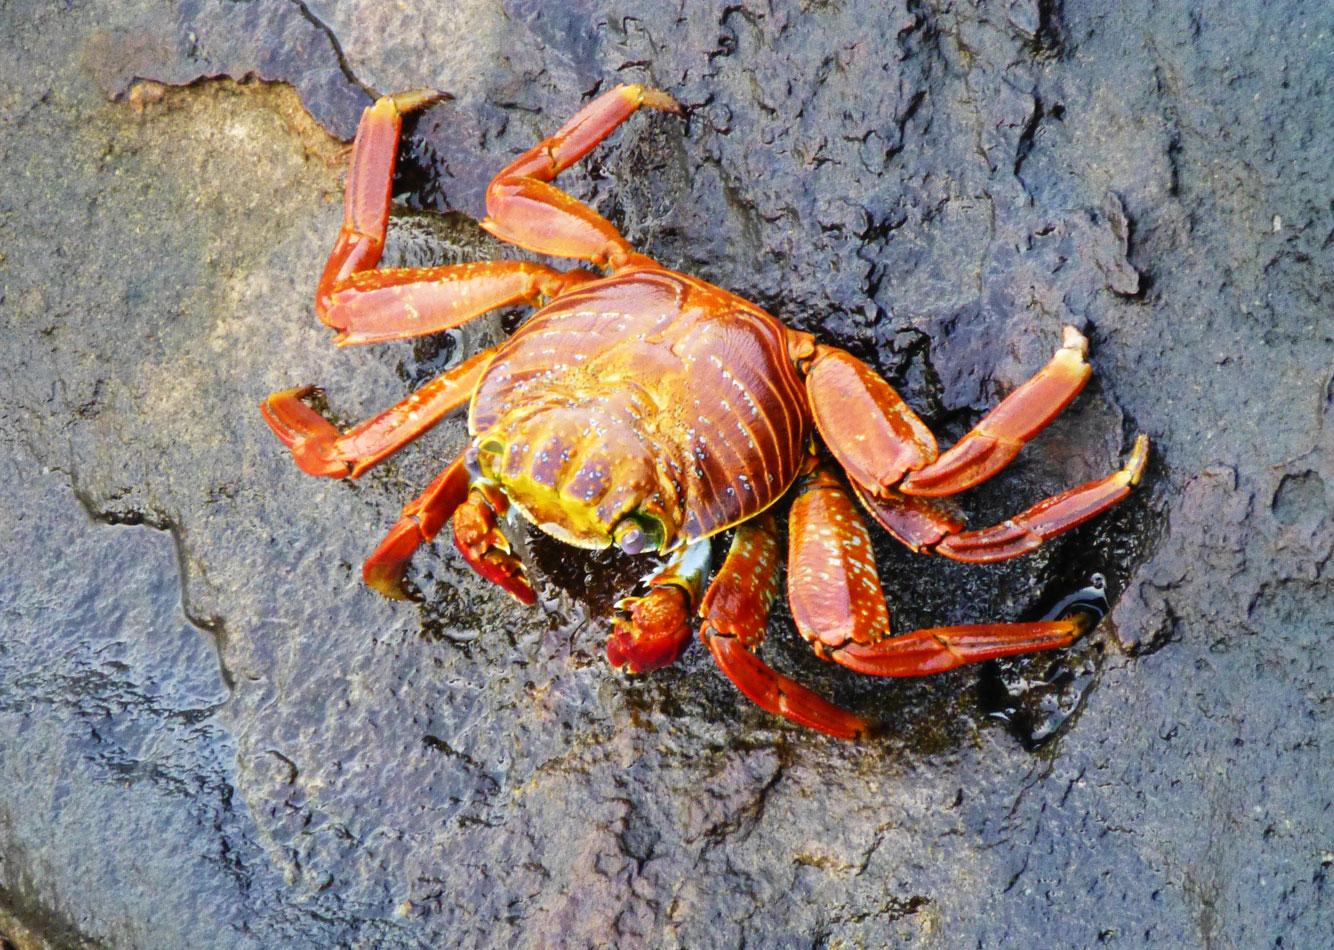 A Sally lightfoot crab